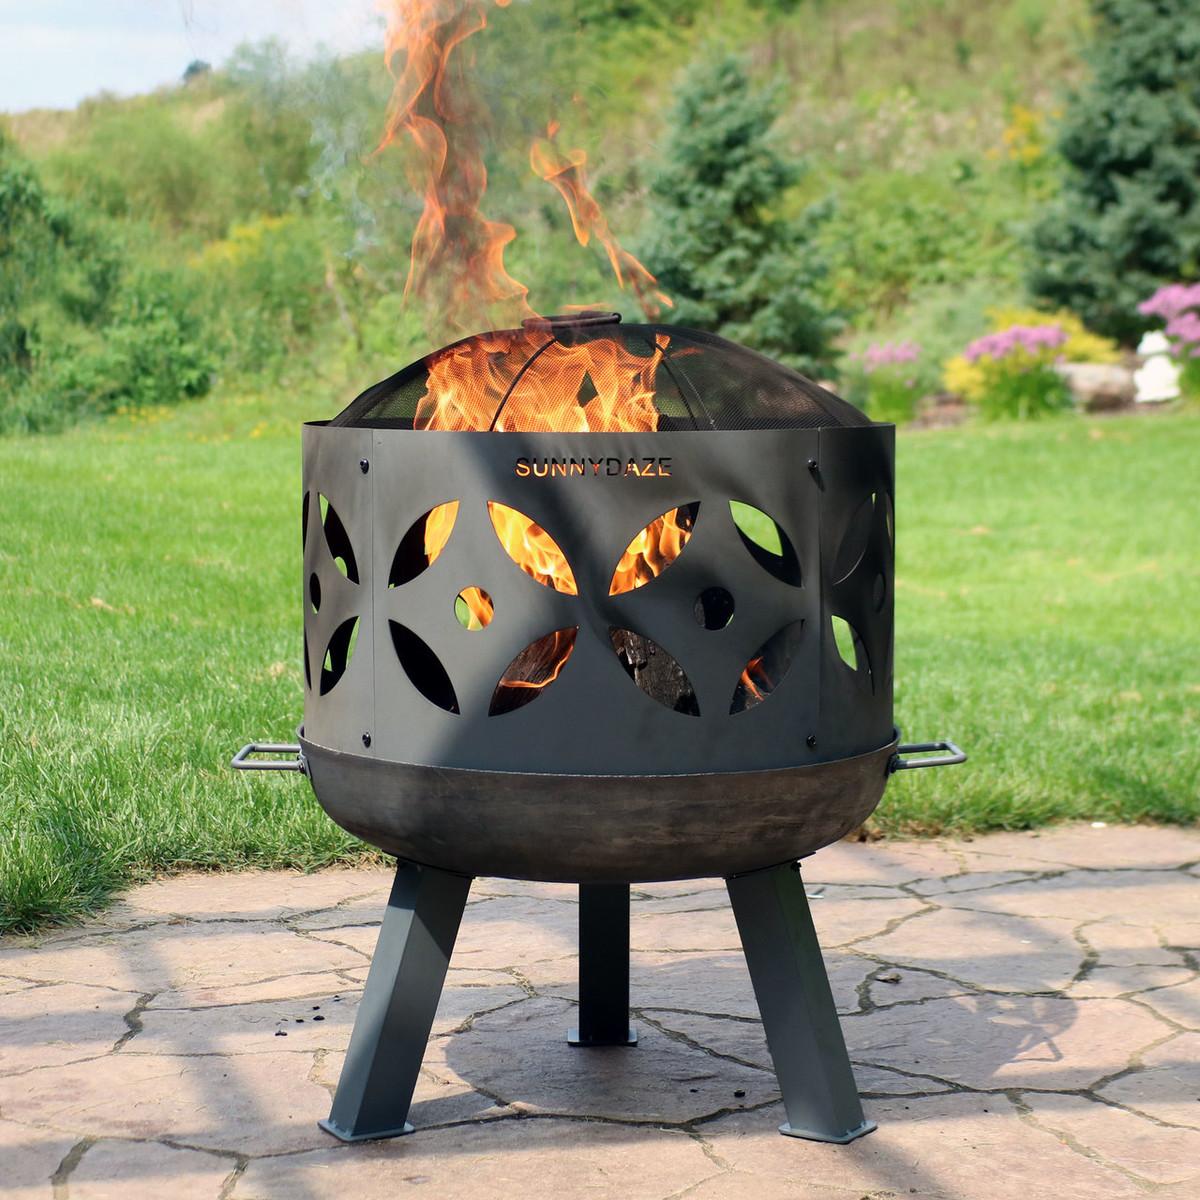 Sunnydaze 26 Inch Diameter Retro Cast Iron Outdoor Fire Pit With